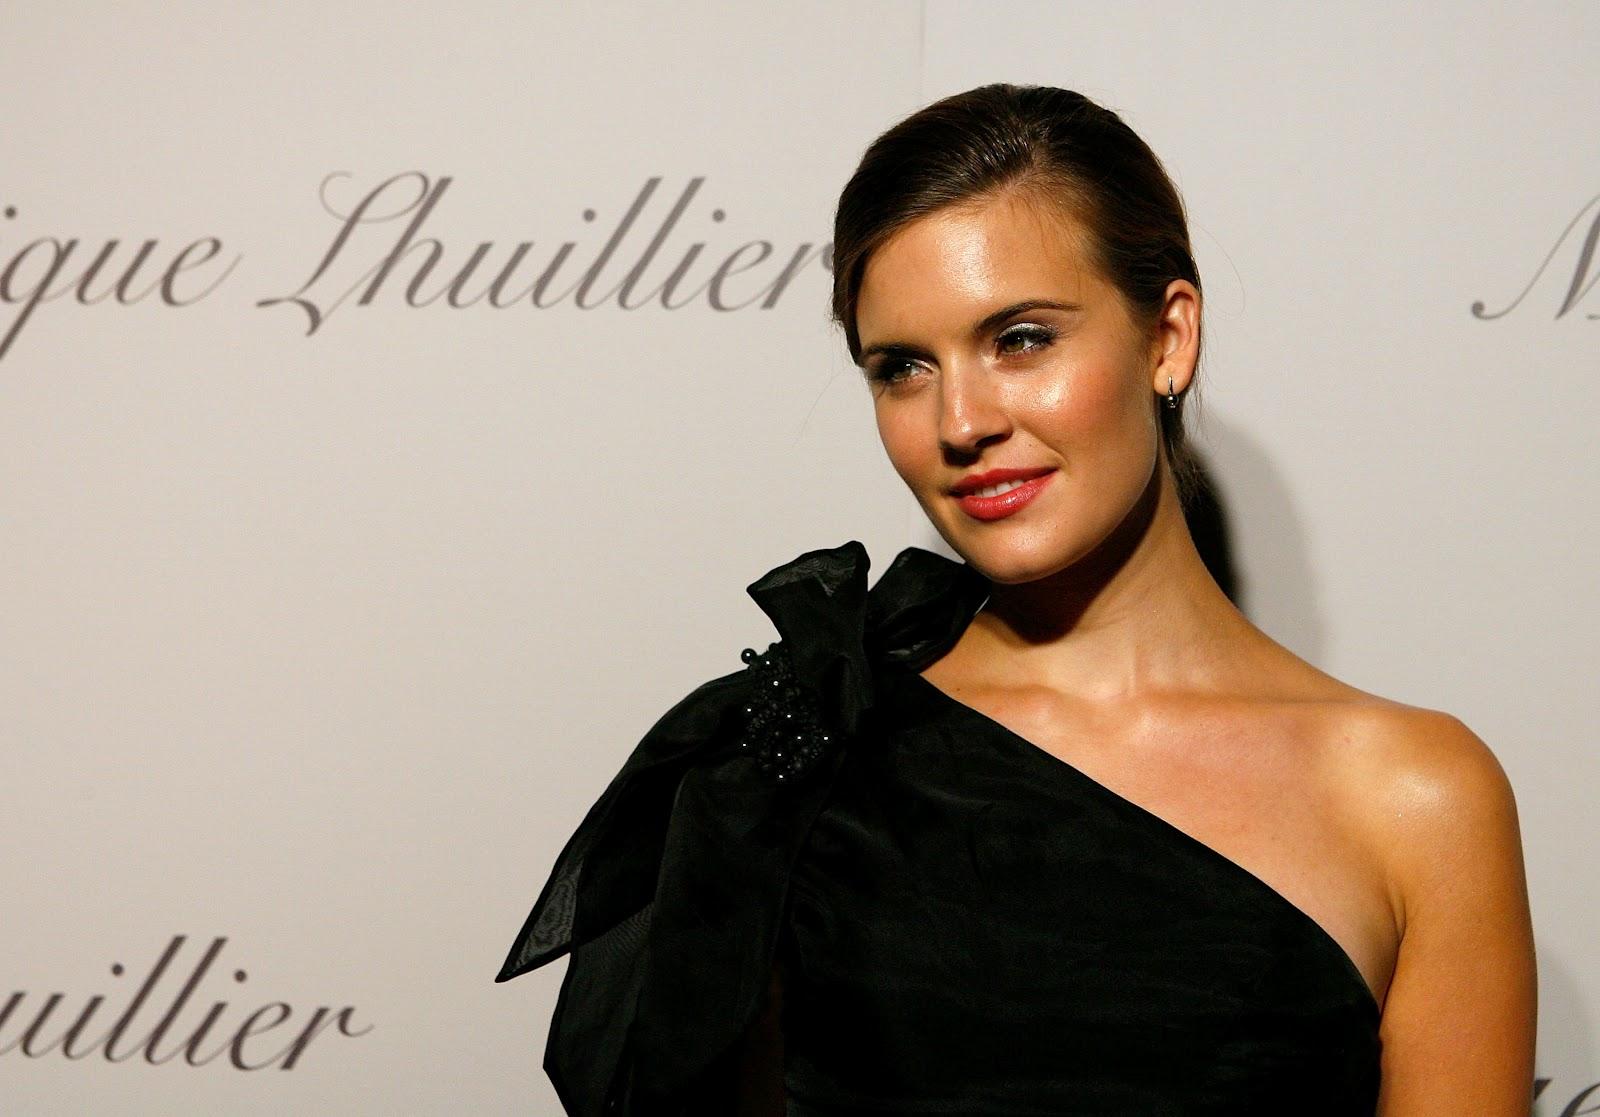 http://3.bp.blogspot.com/-DEuRy5yOeVo/T4r9iL634_I/AAAAAAAAFcY/g7bwF48xVGo/s1600/01899-celebutopia-maggie-grace-monique-lhuillier-s.jpg